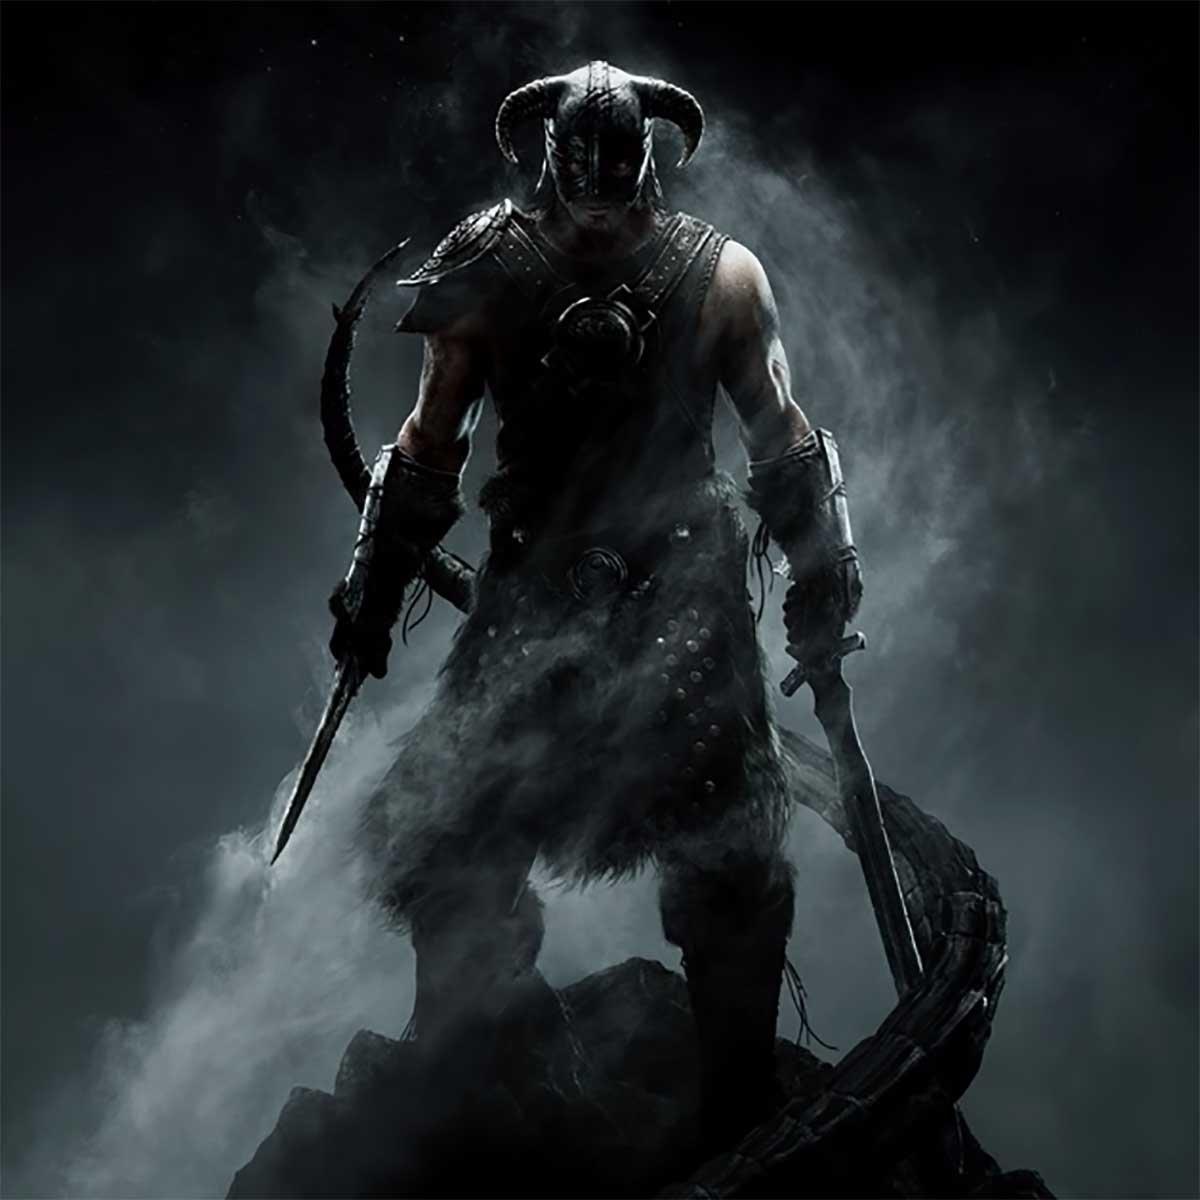 The Elder Scrolls 6 - Release Date, News, Rumors, Exclusivity, Trailers